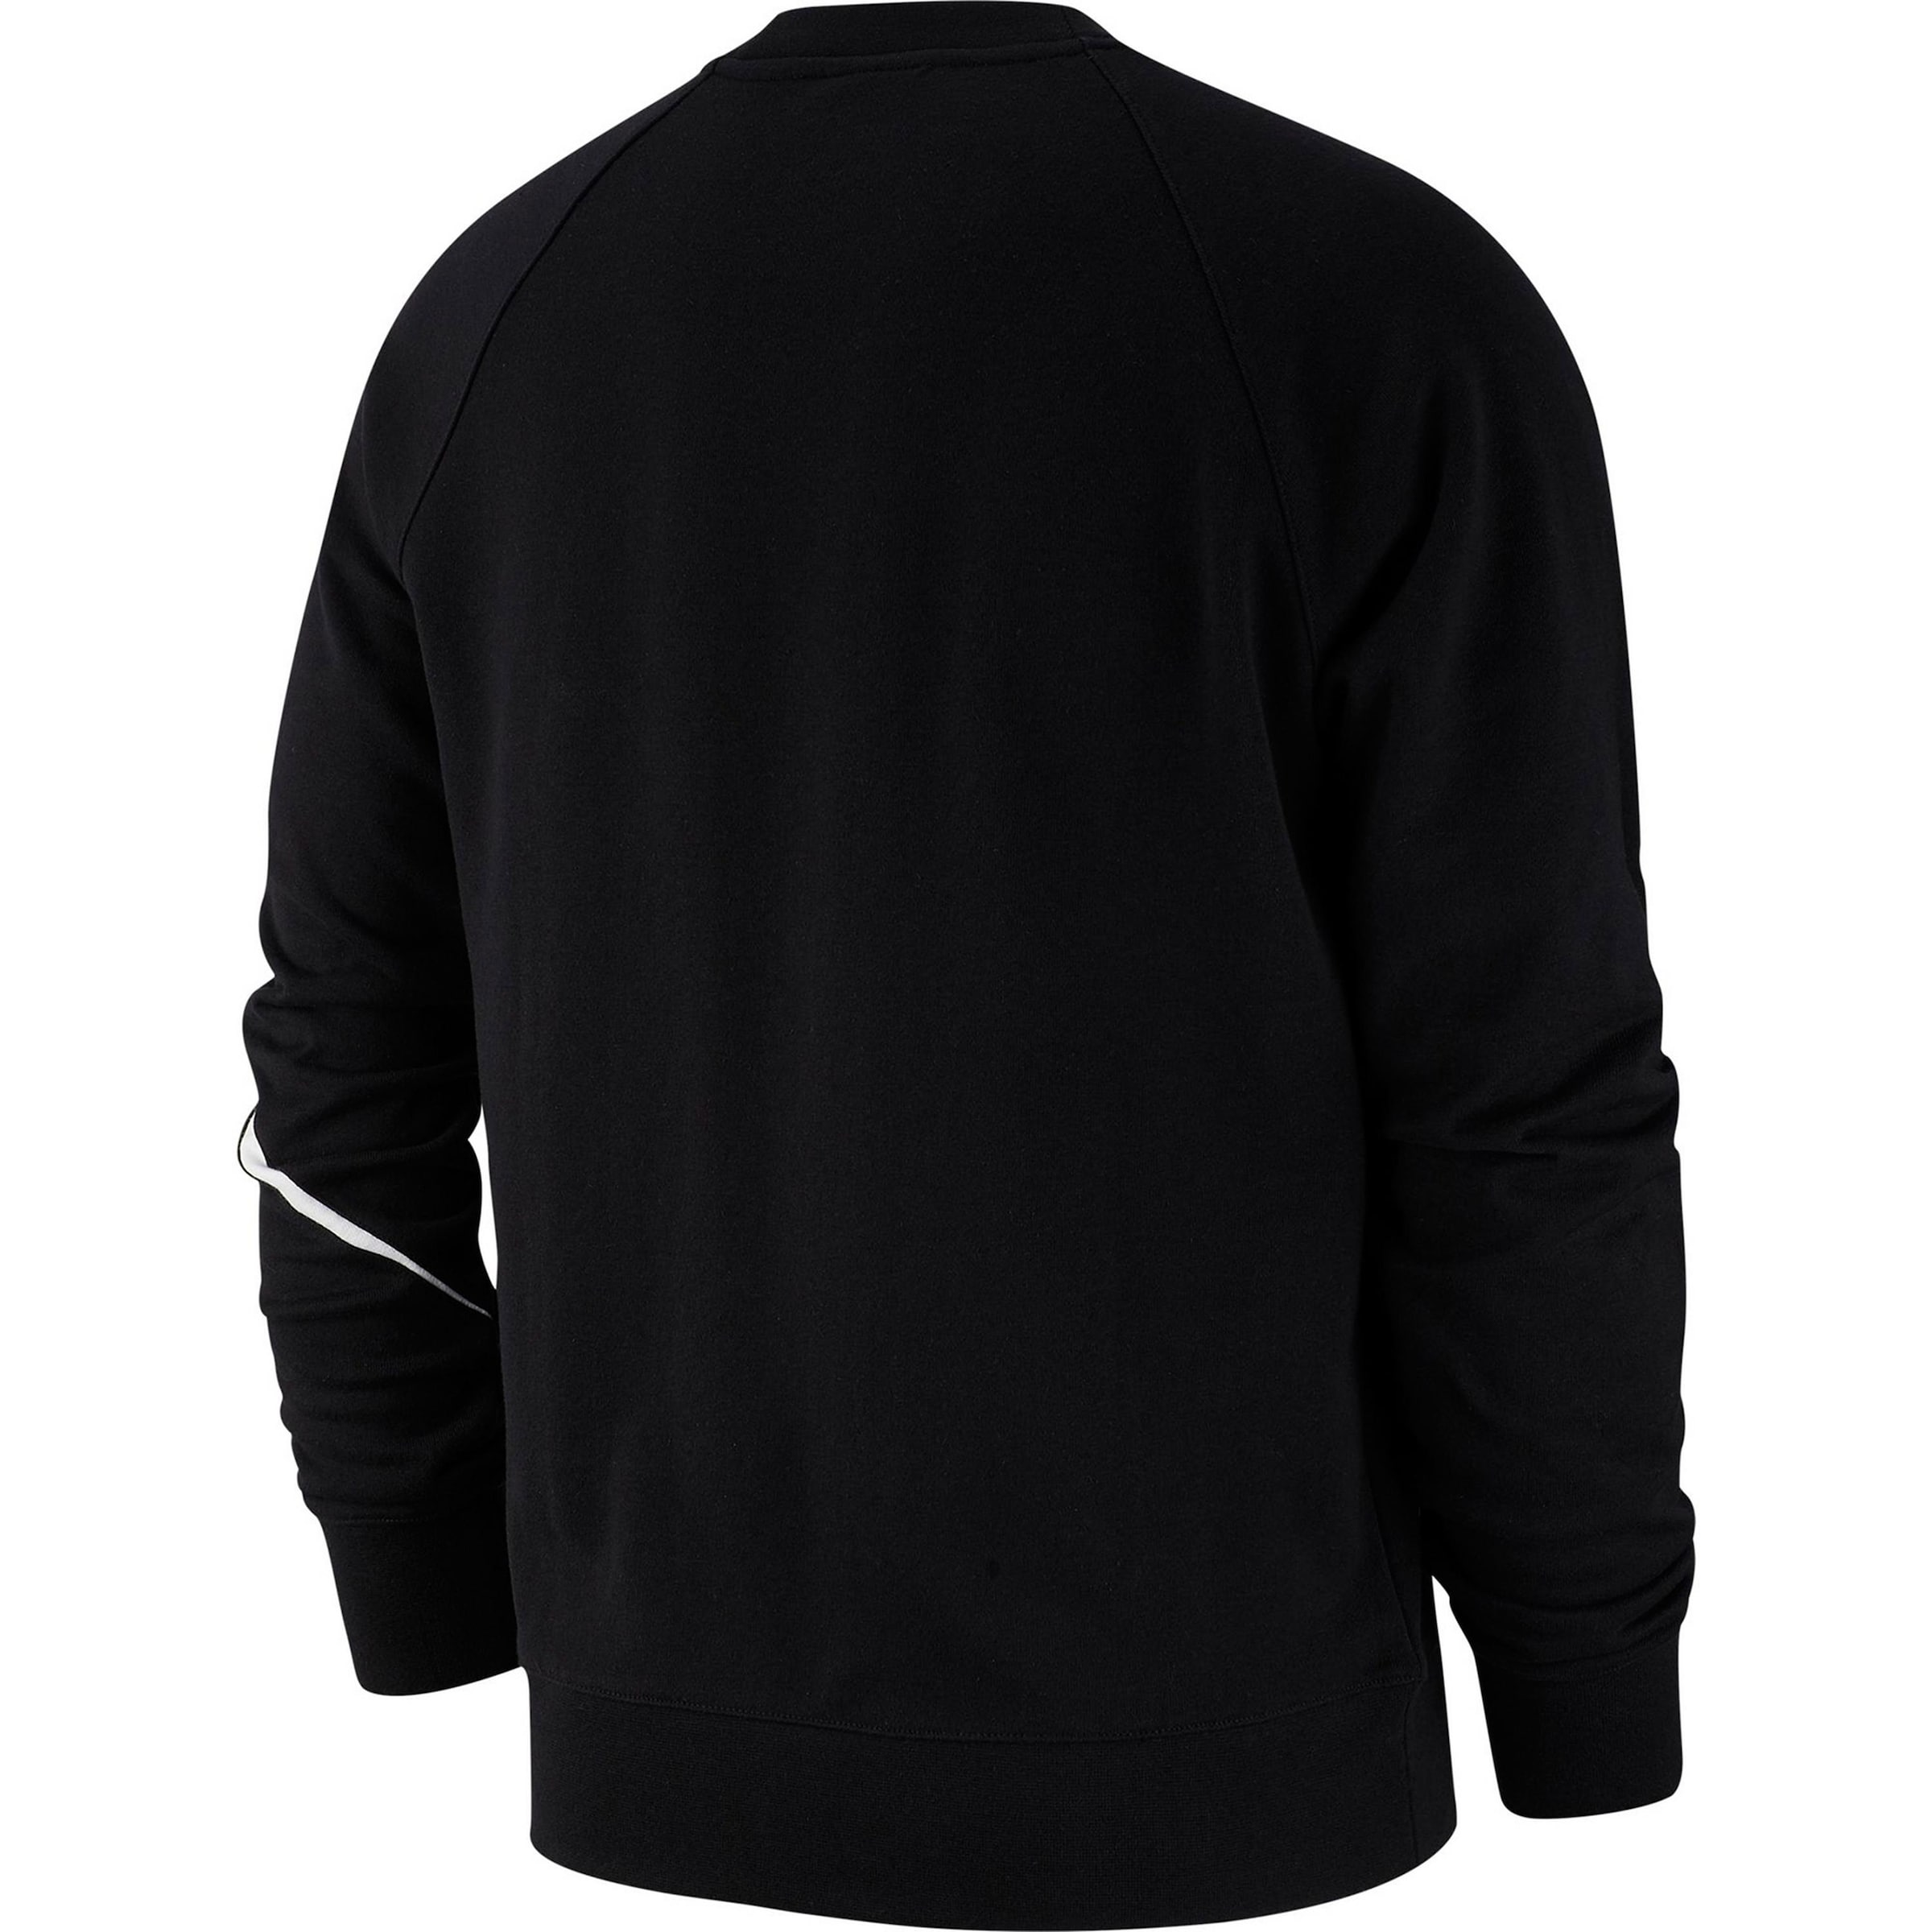 In Pullover SchwarzWeiß Sportswear Nike sCthQrd